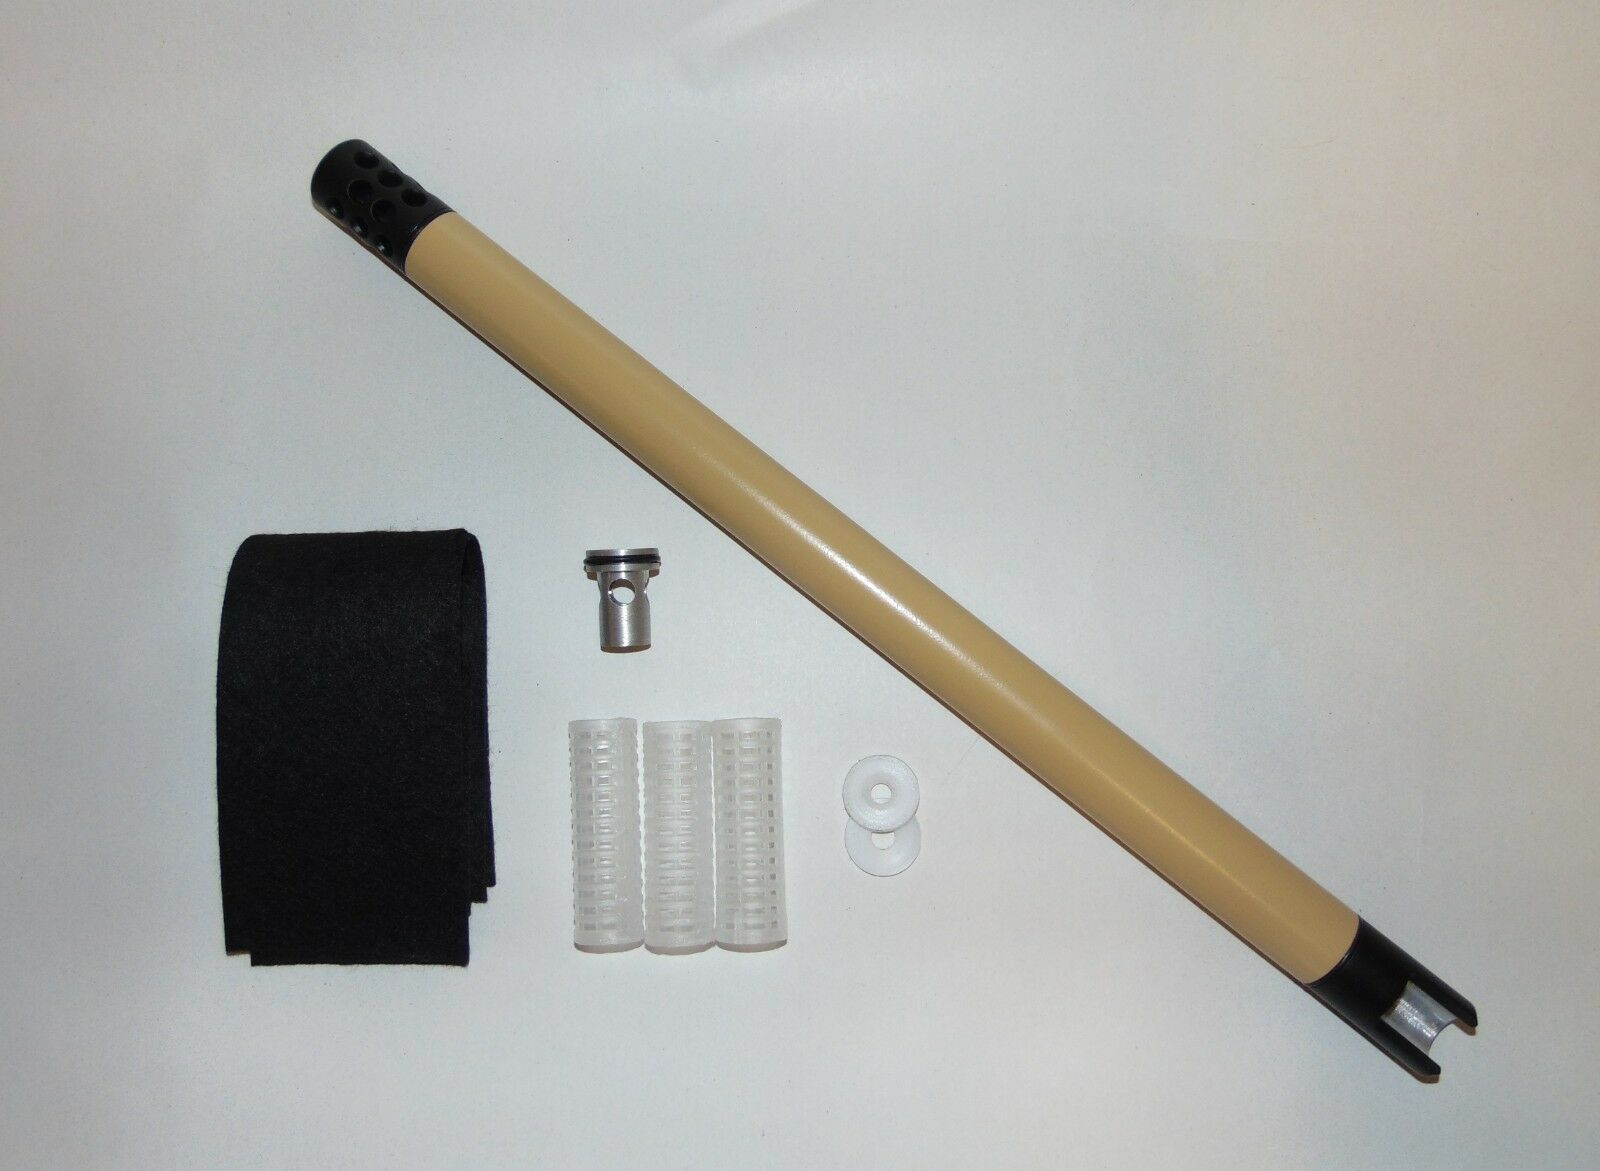 Kit Completo sudario en arena del desierto con Tapa Ventilada Para Adaptarse Bsa preCochega rifles